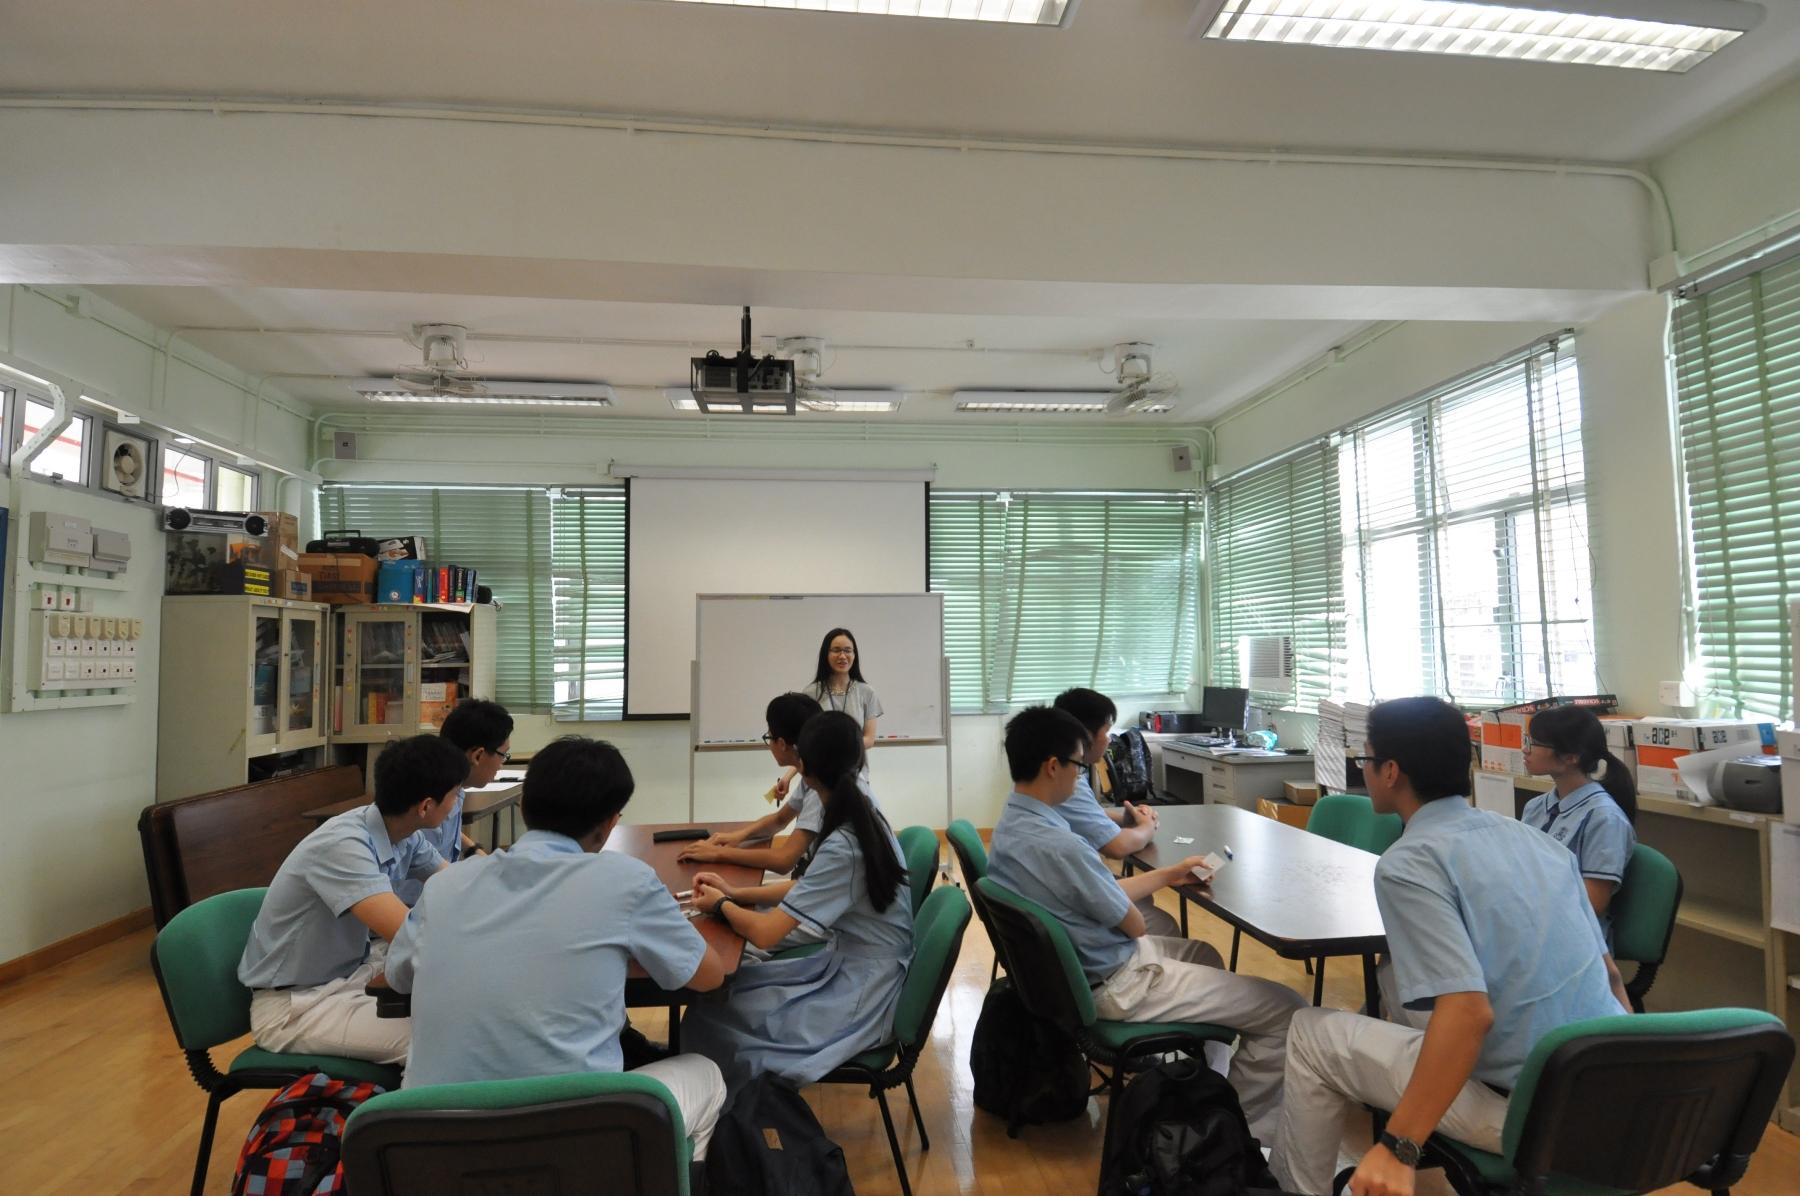 http://npc.edu.hk/sites/default/files/dsc_0004.jpg